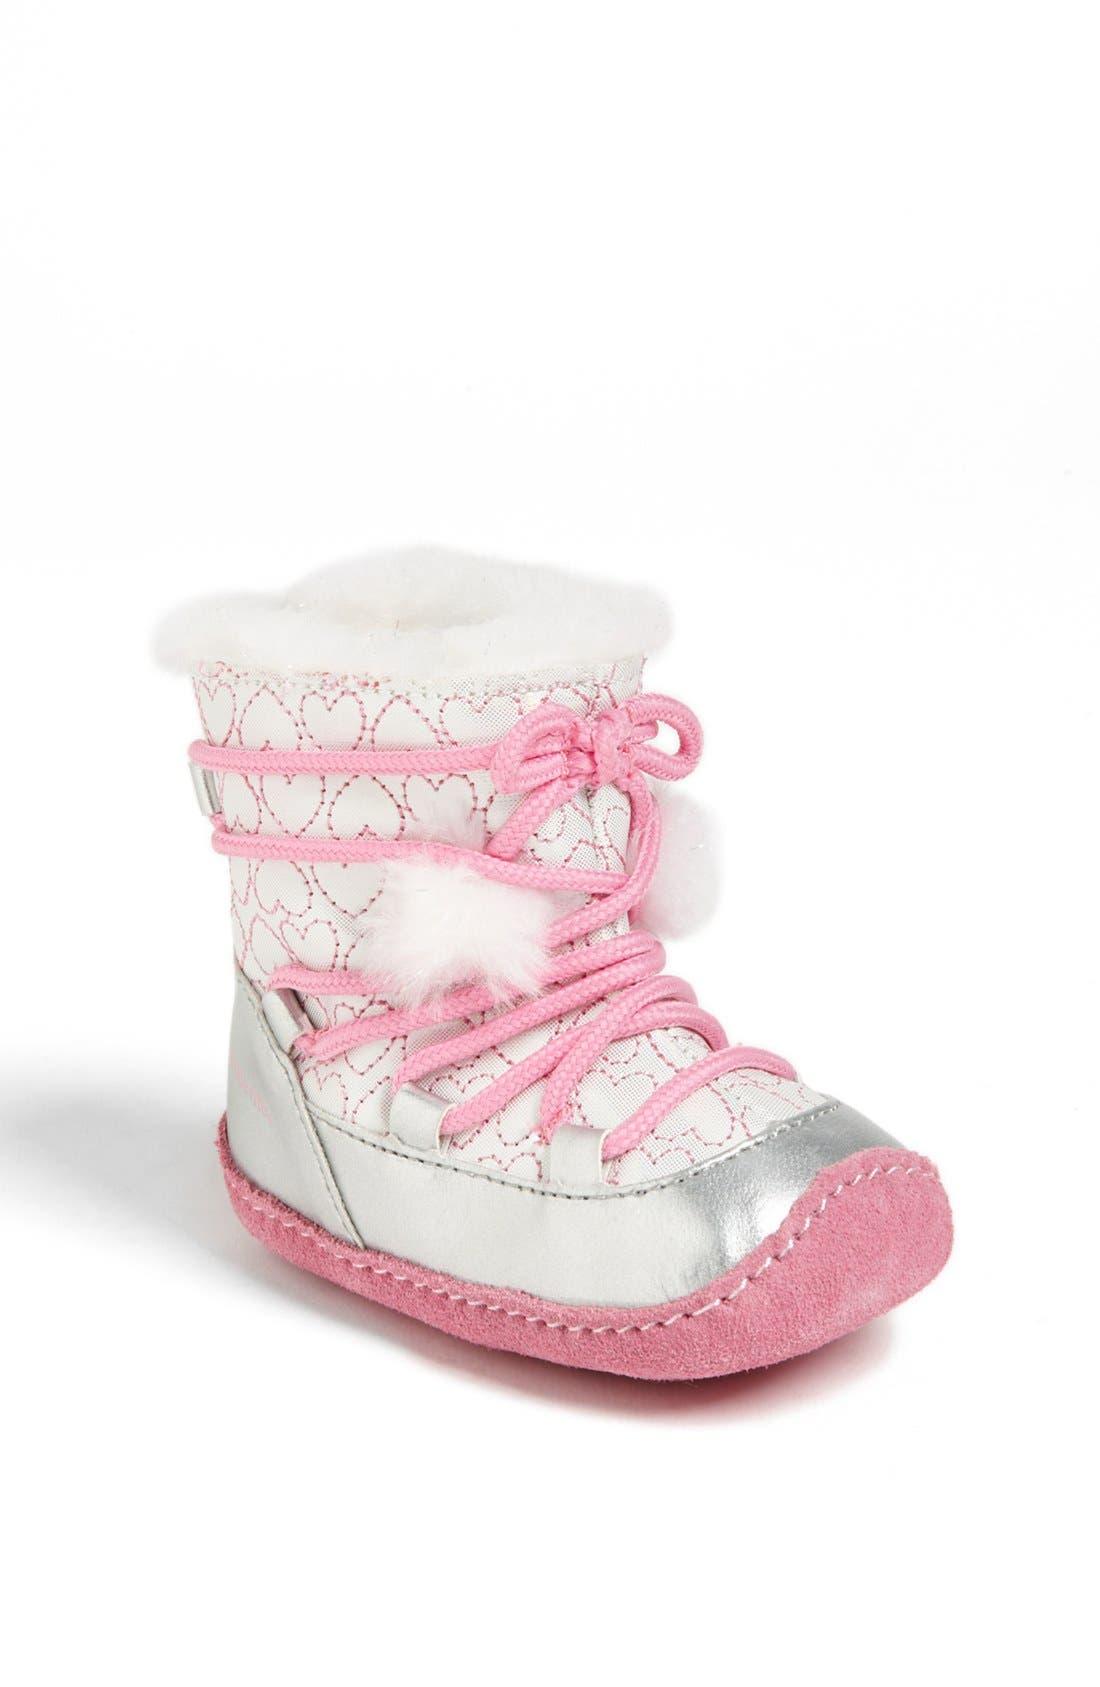 Main Image - Stride Rite 'Crawl - Snowdrop' Boot (Baby Girls)